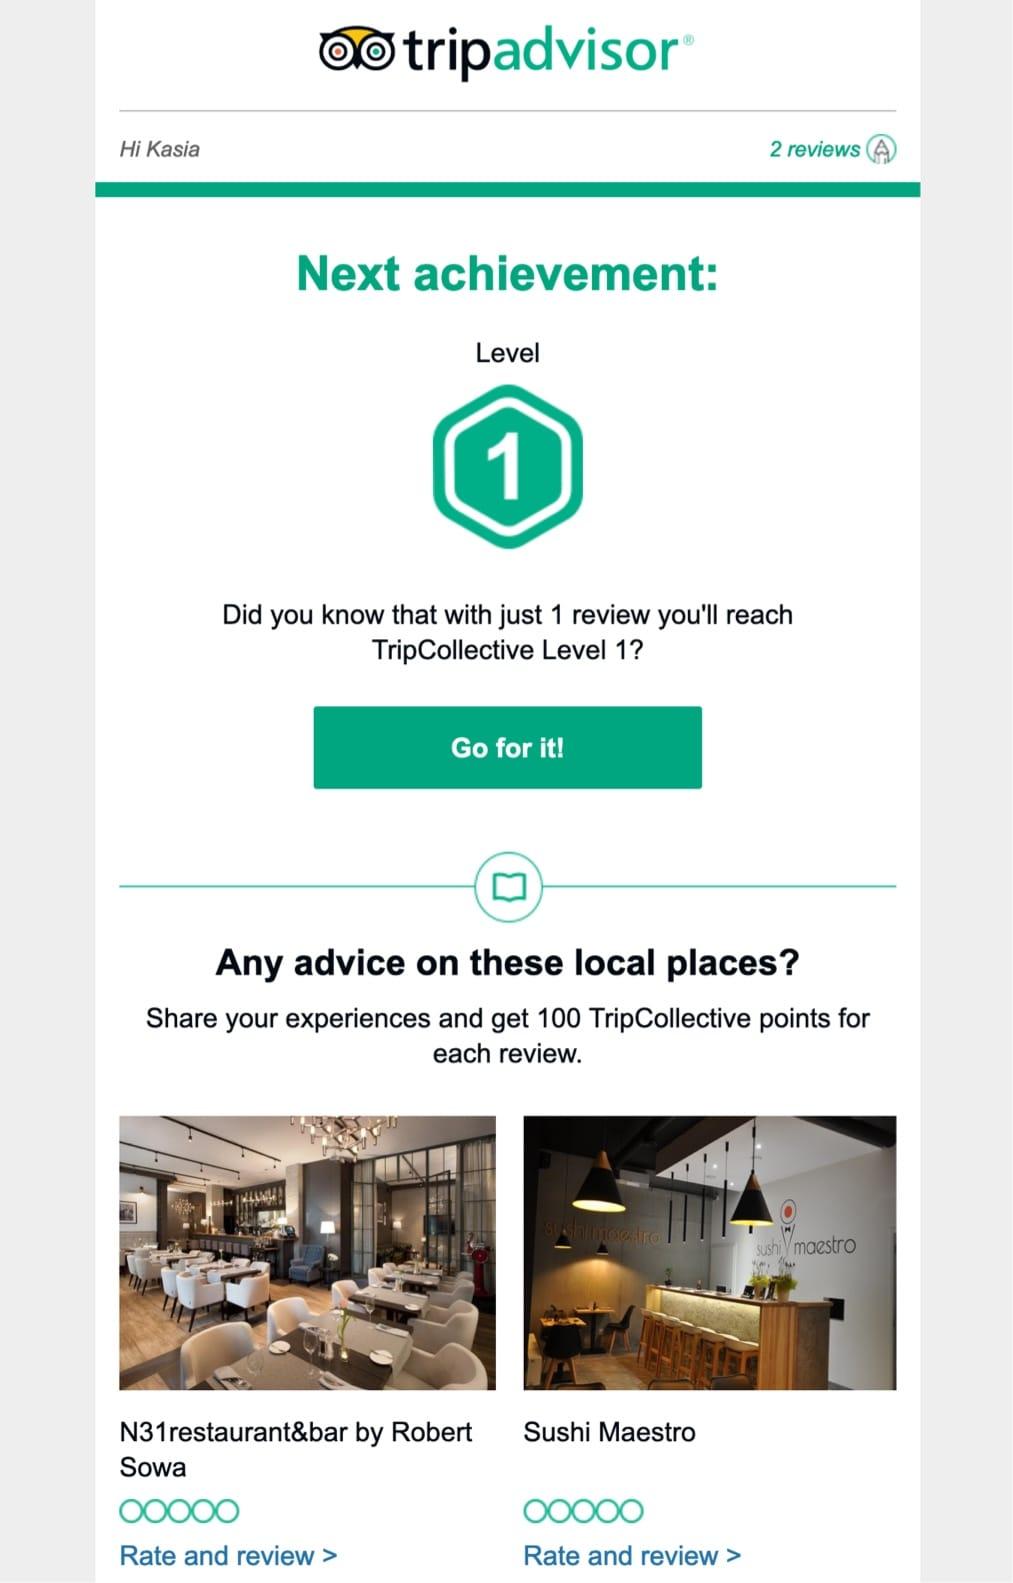 email-marketing-best-practices-tripadvisor